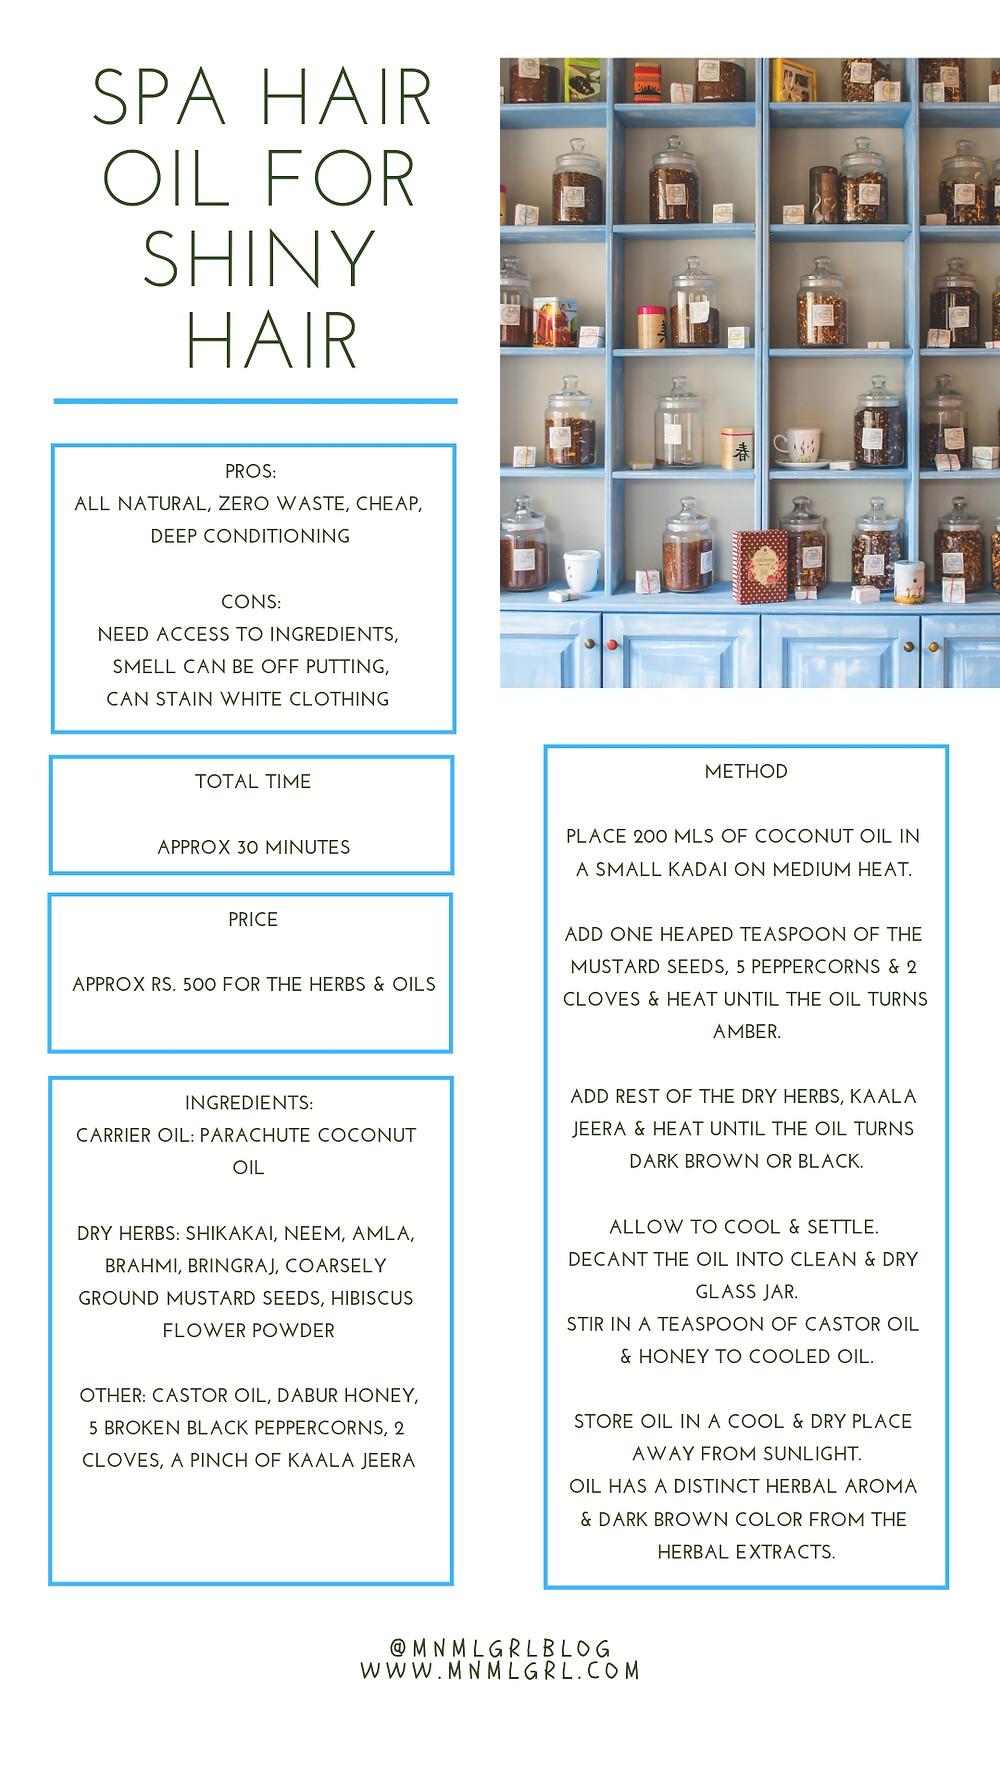 recipe card for diy spa hair oil for shiny healthy hair